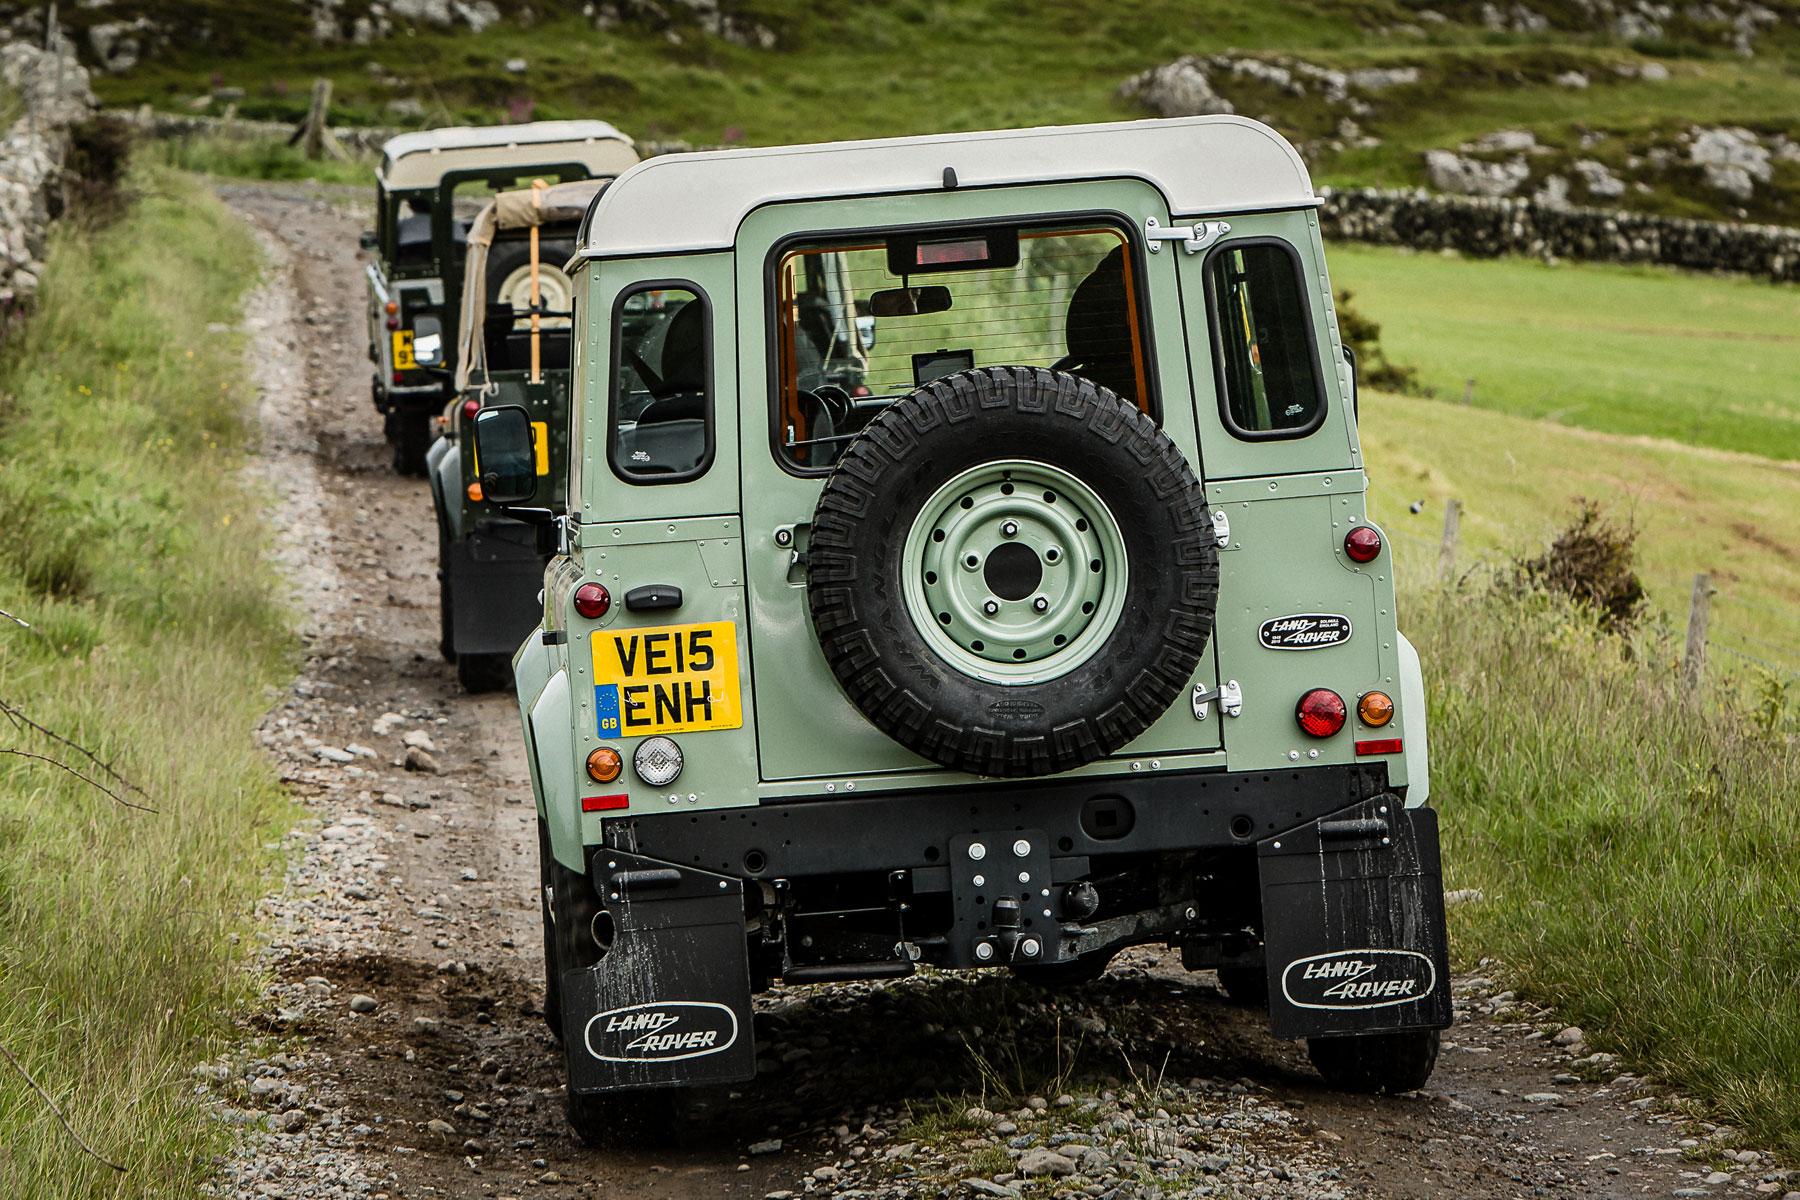 2015 Land Rover Defender: running costs